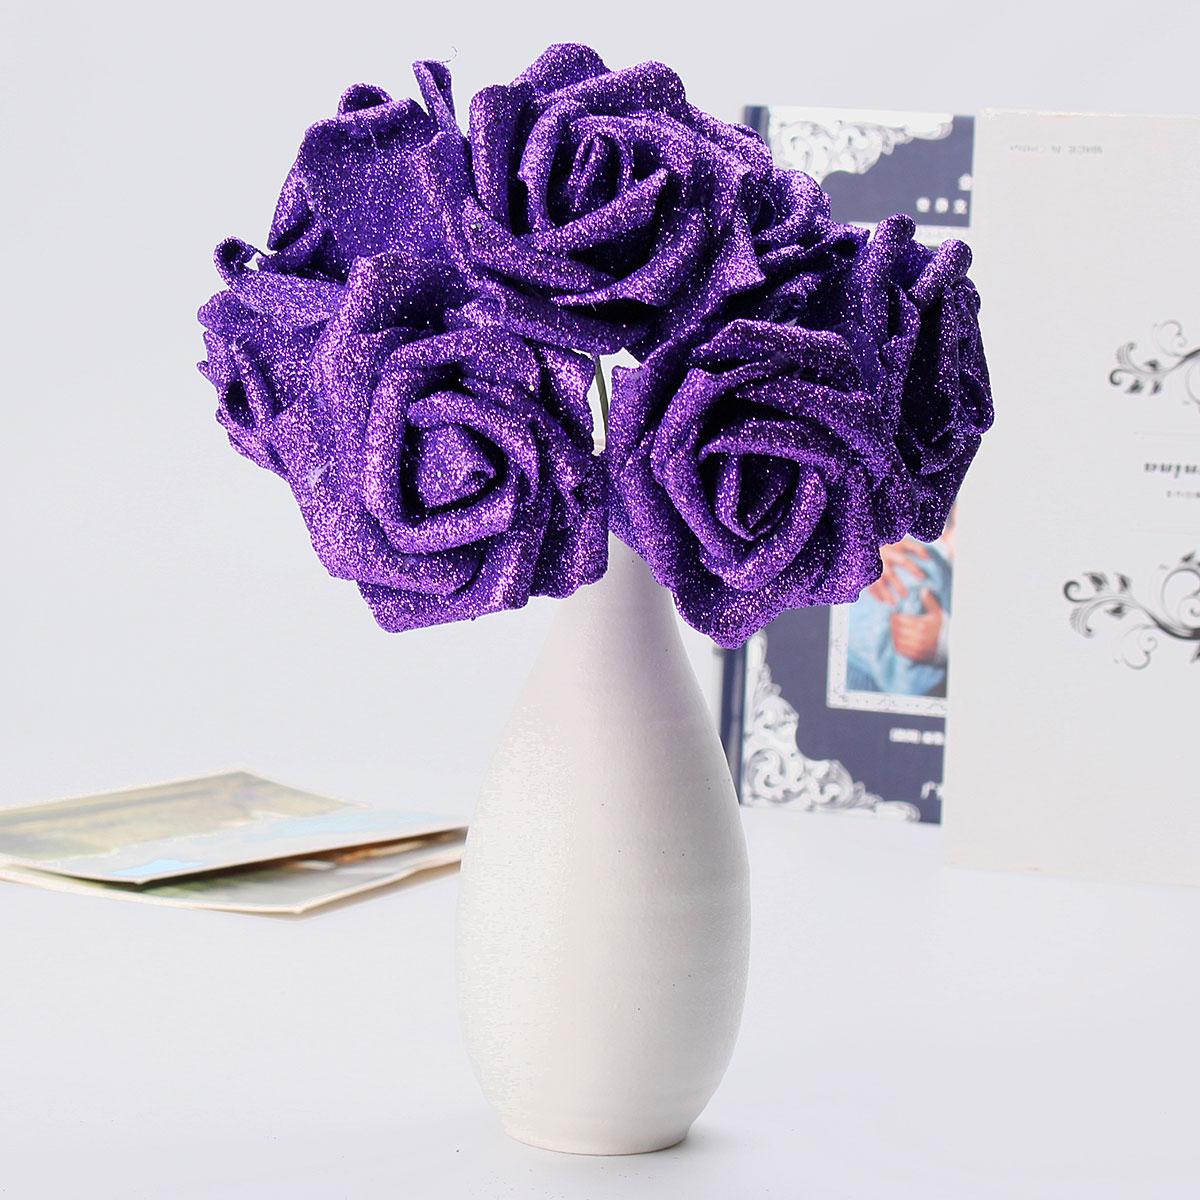 7Pcs Artificial Bouquet Glitter Foam Artificial Flowers Wedding Bridal Party Decor DIY Rose